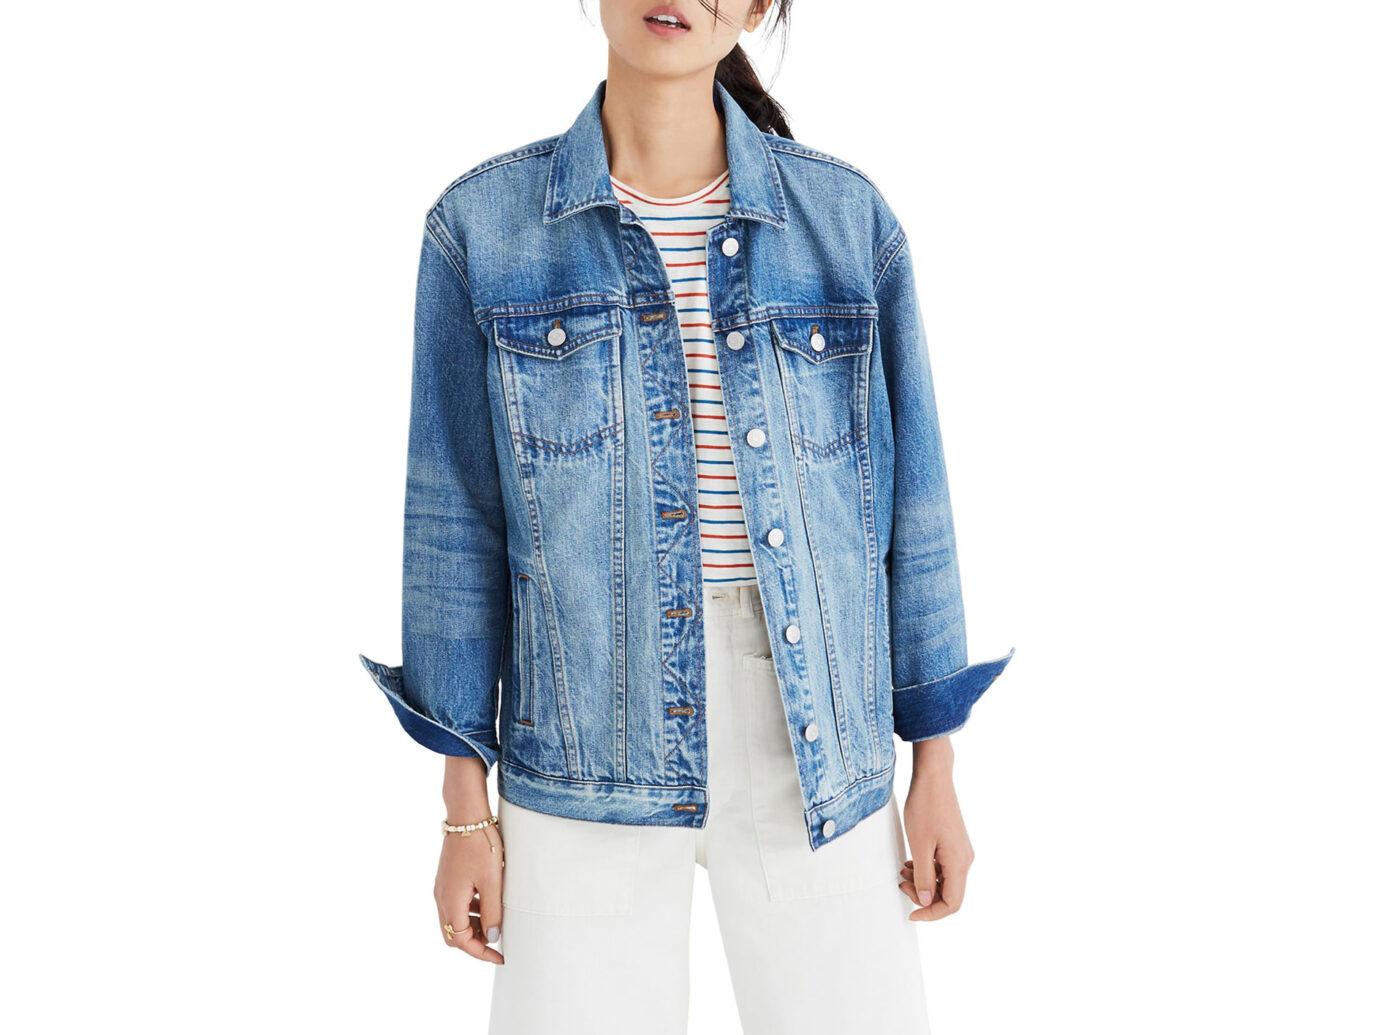 Madewell Oversize Denim Jacket